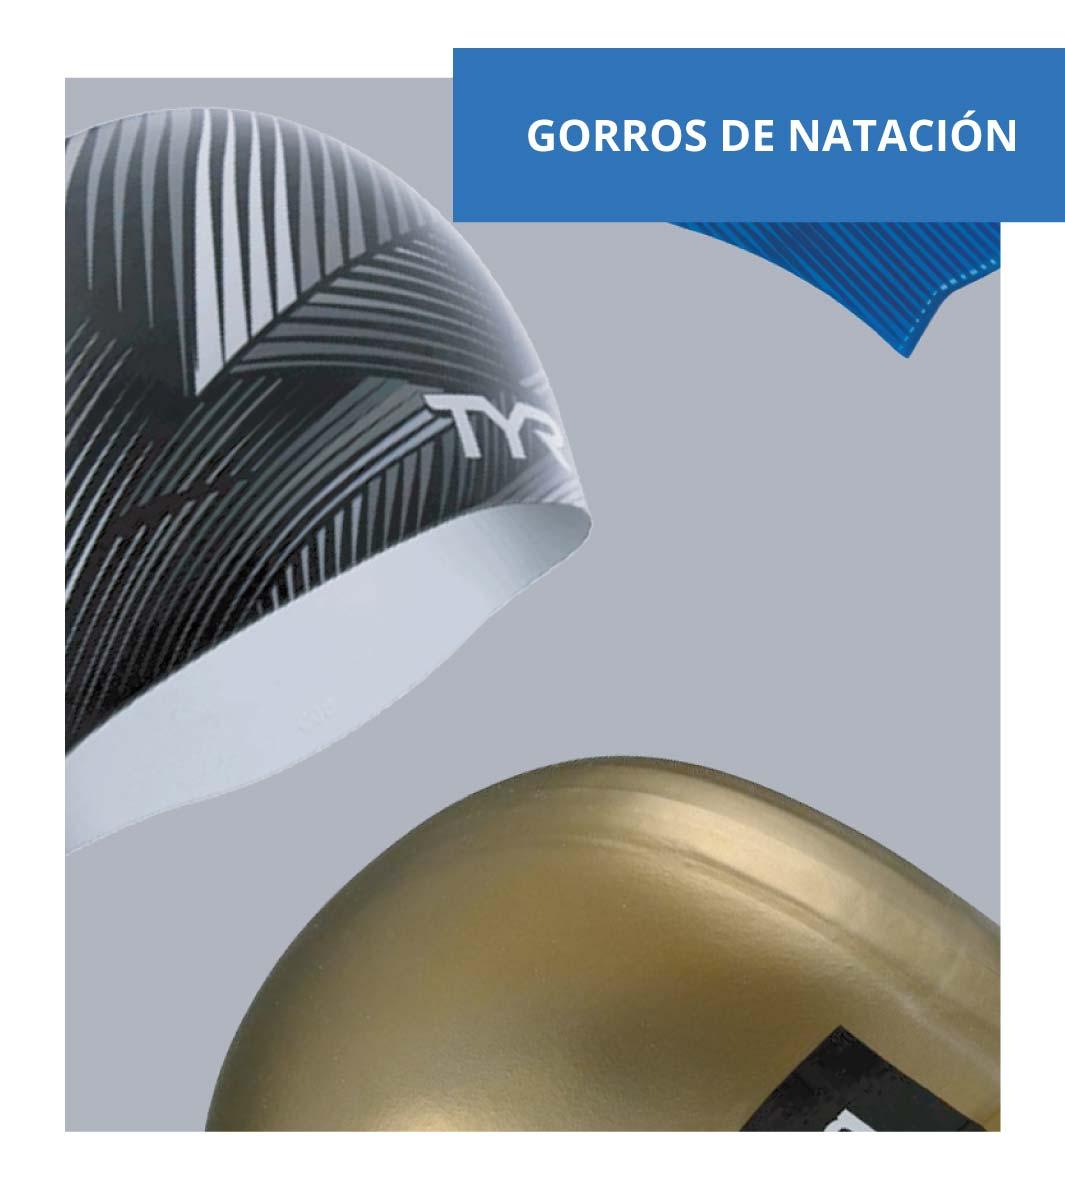 COMPRA GORROS